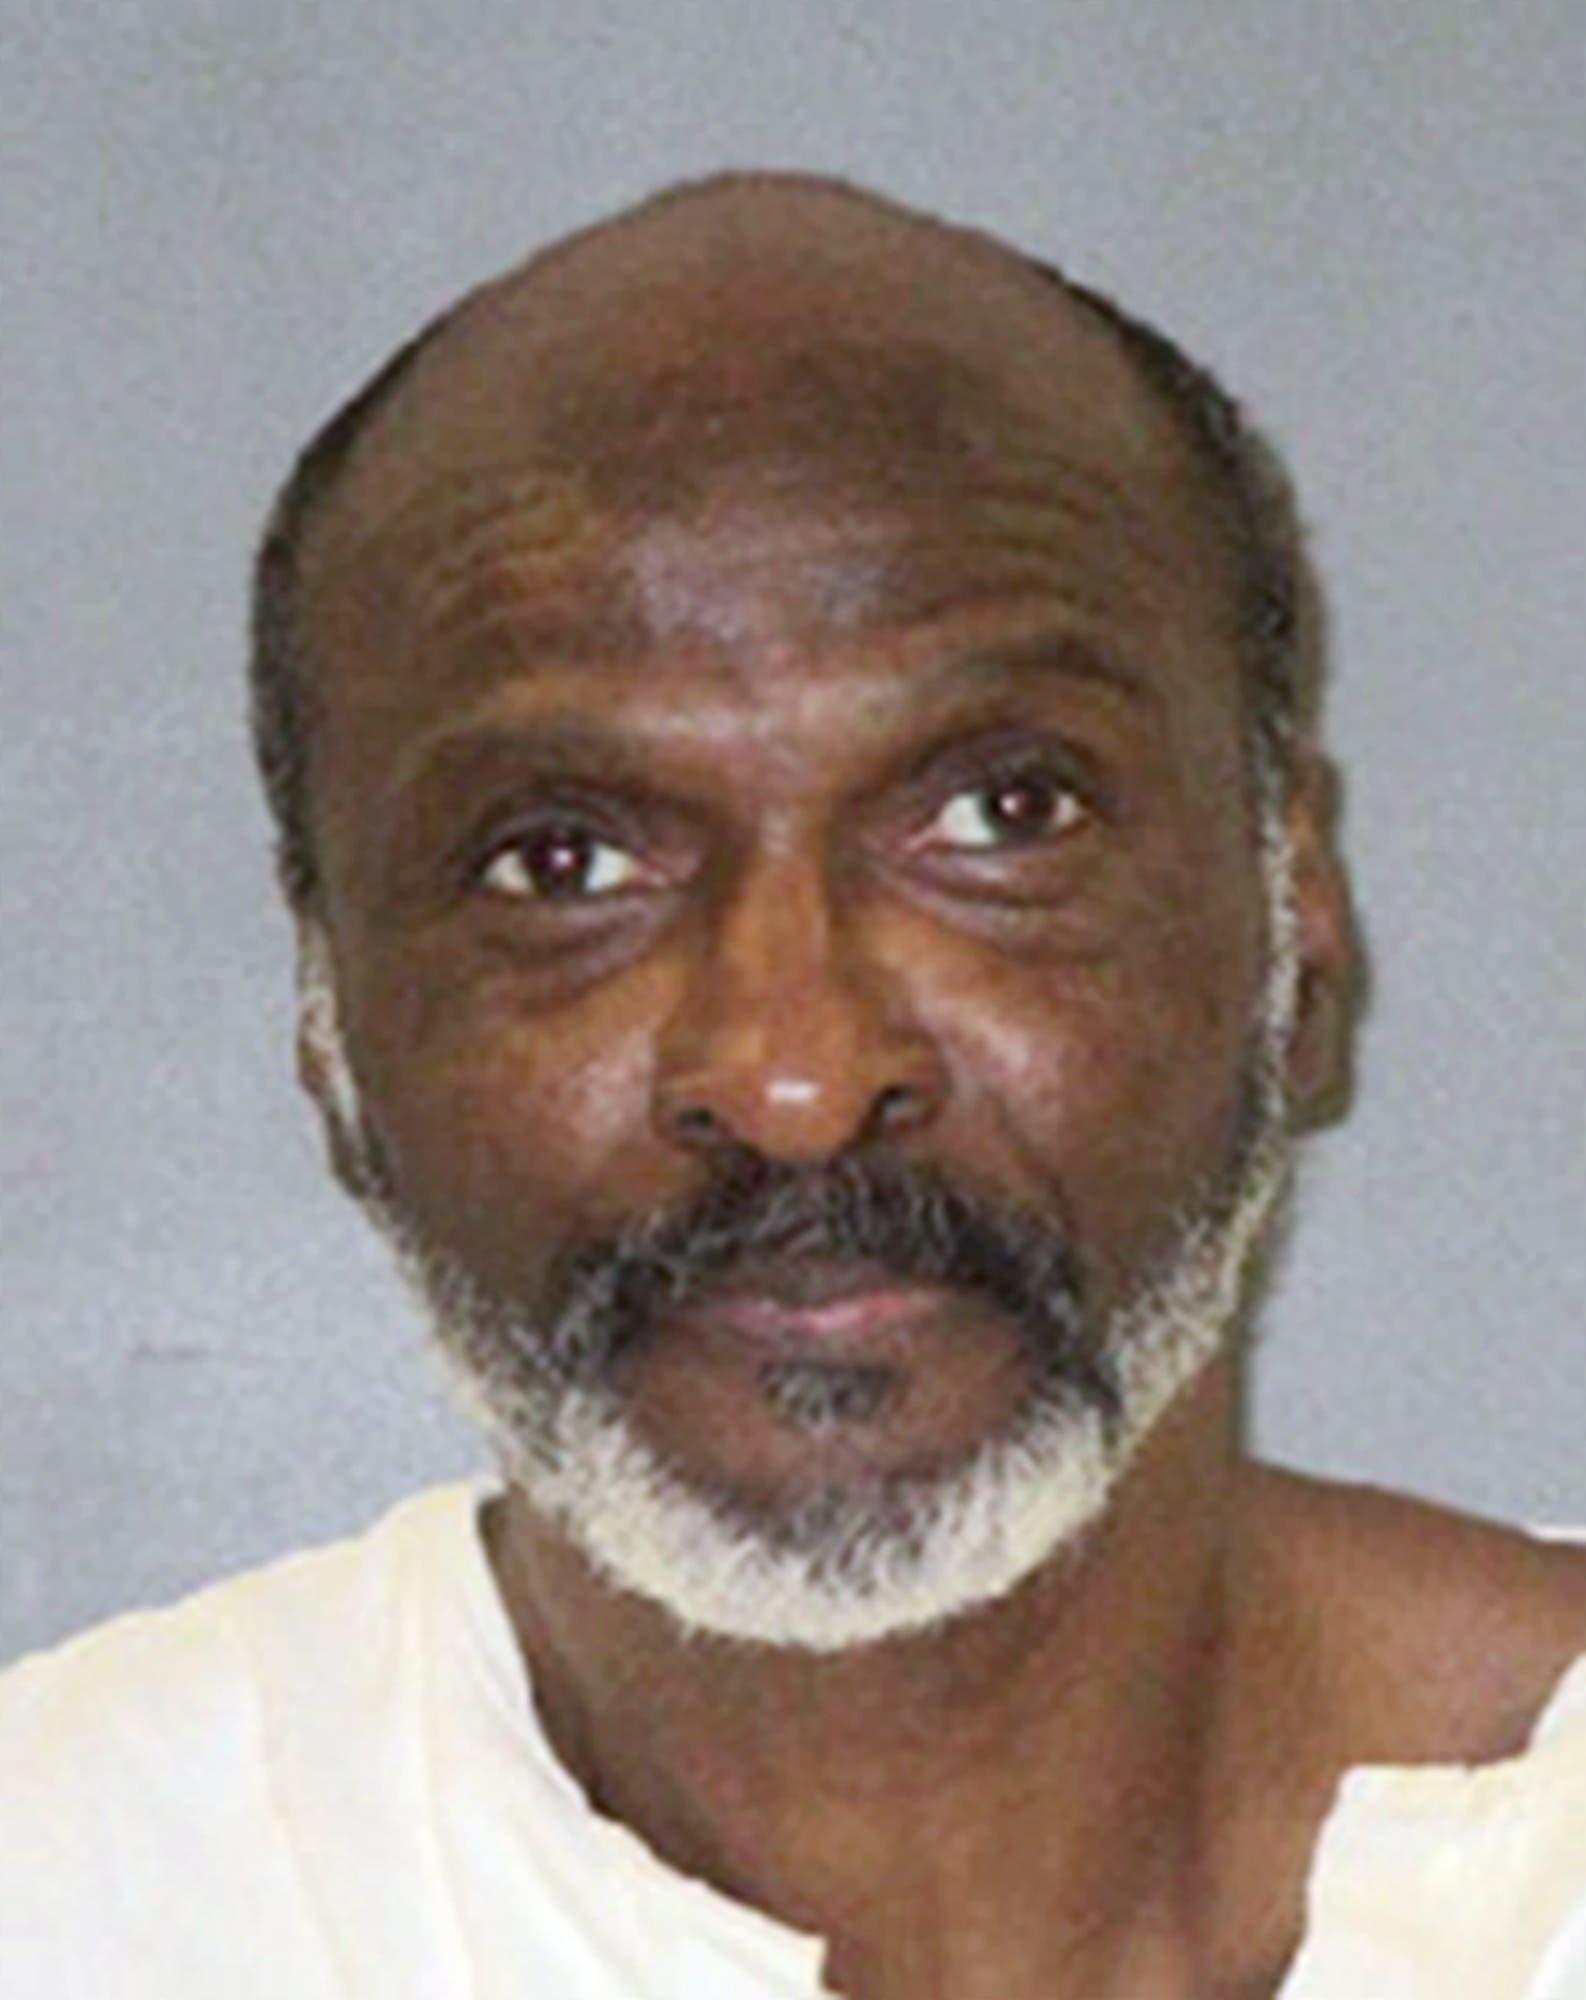 Texas ejecuta a hombre que asesinó a su exnovia en 1999